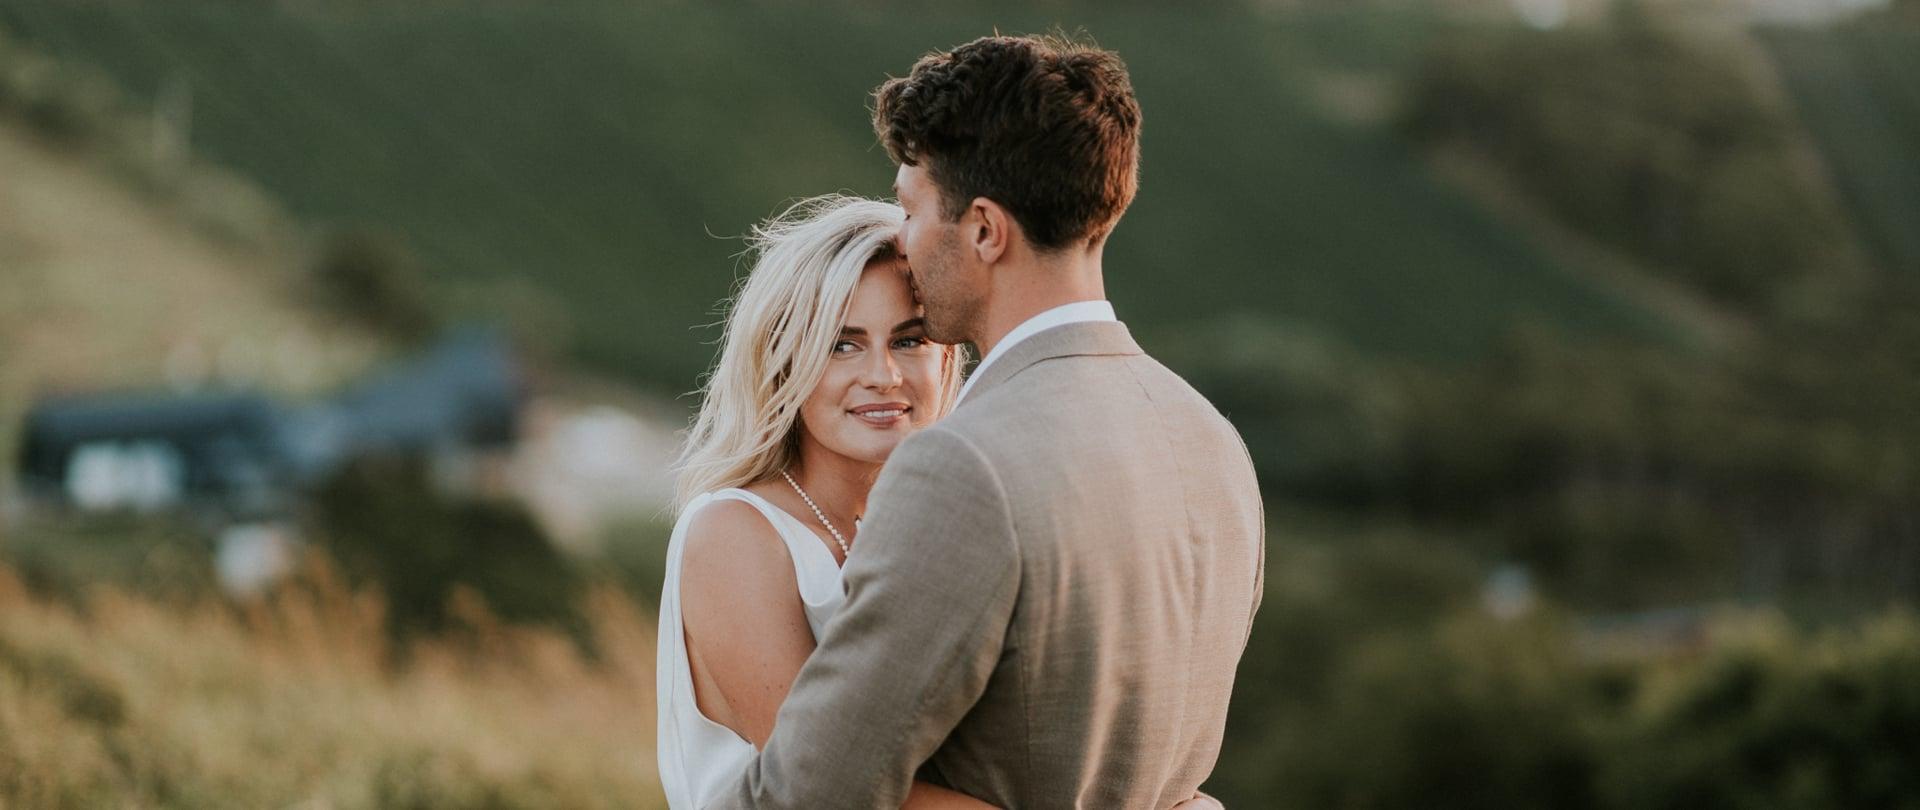 Matilda & Arthur Wedding Video Filmed at Waiheke Island, New Zealand